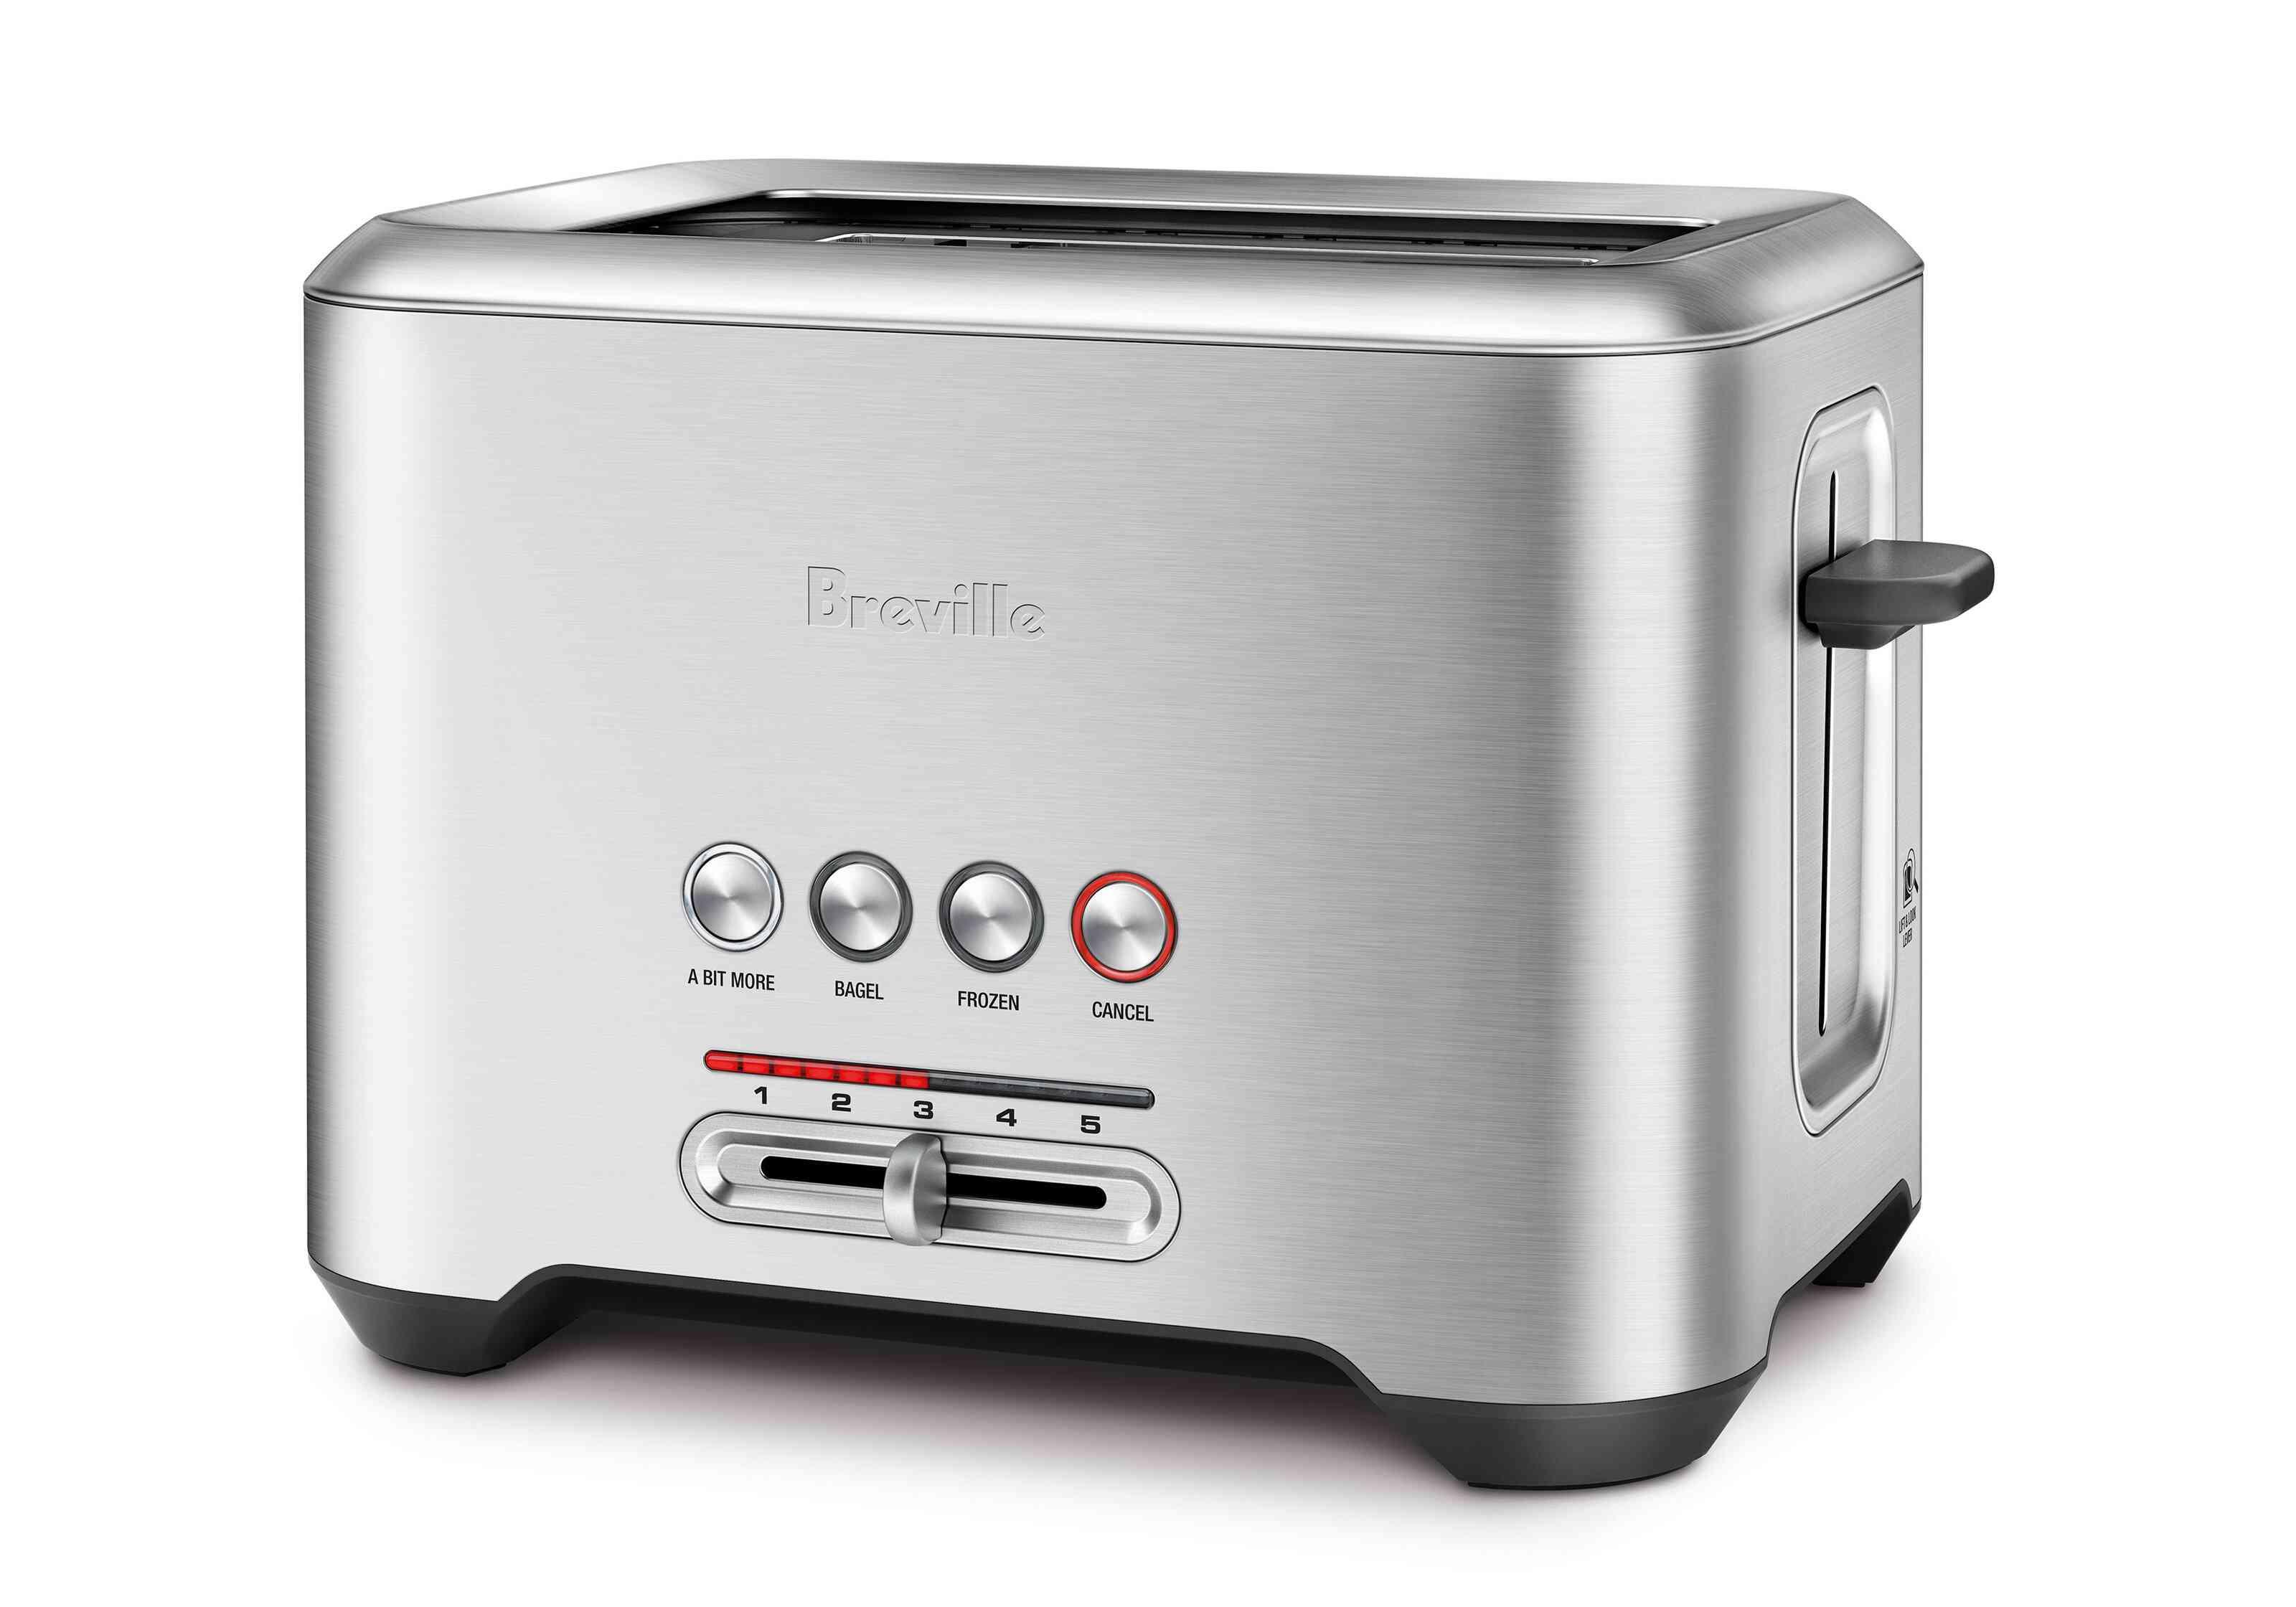 breville-the-bit-more-toaster-2-slice